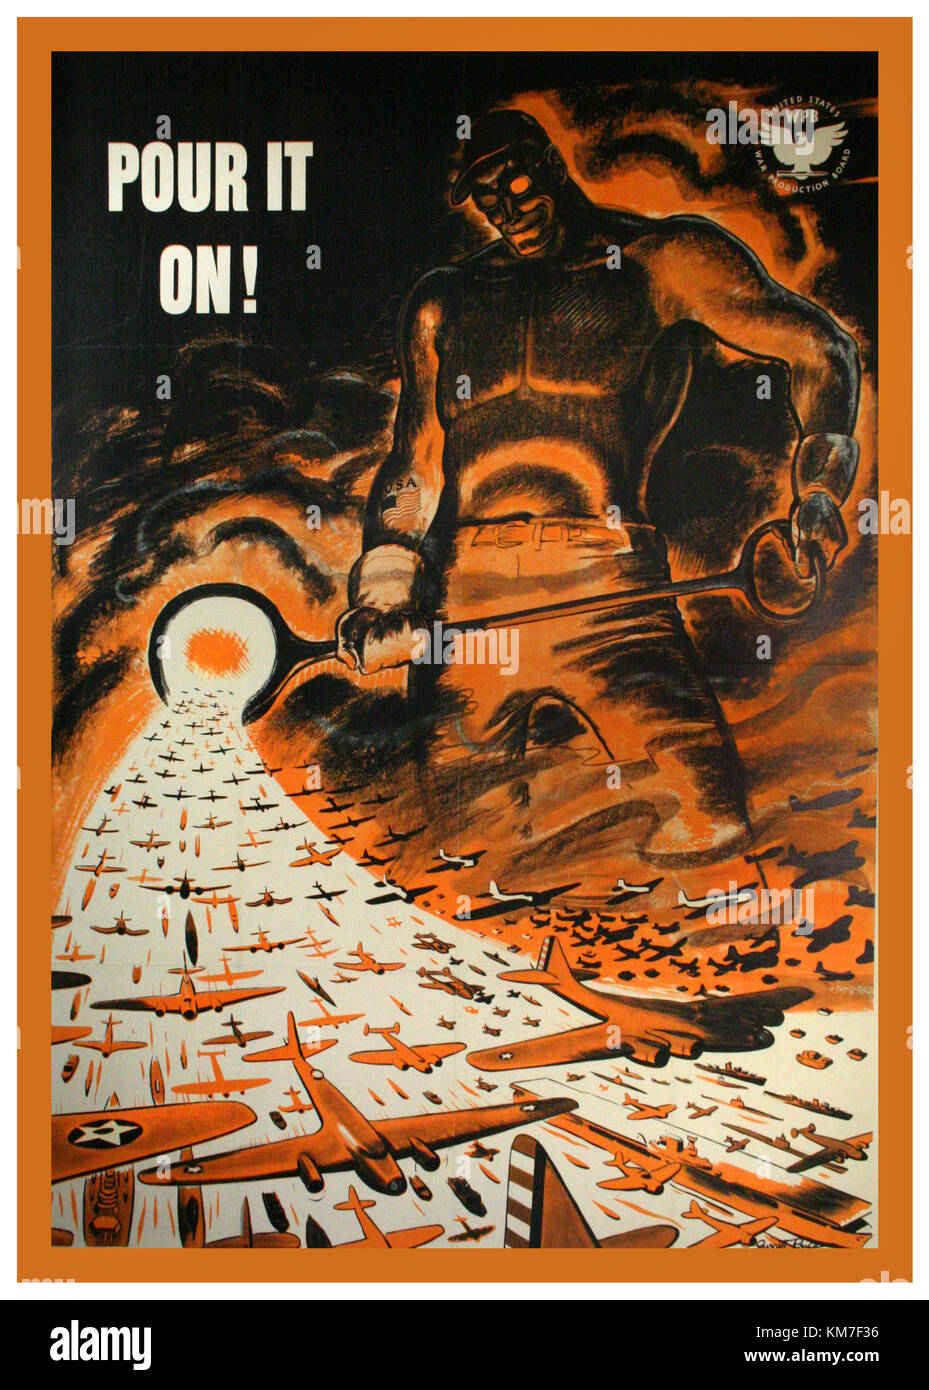 1940's WW2 Vintage American propaganda poster 'POUR IT ON' ! 1942. Original WW2 Poster by Garrett Price - Stock Image